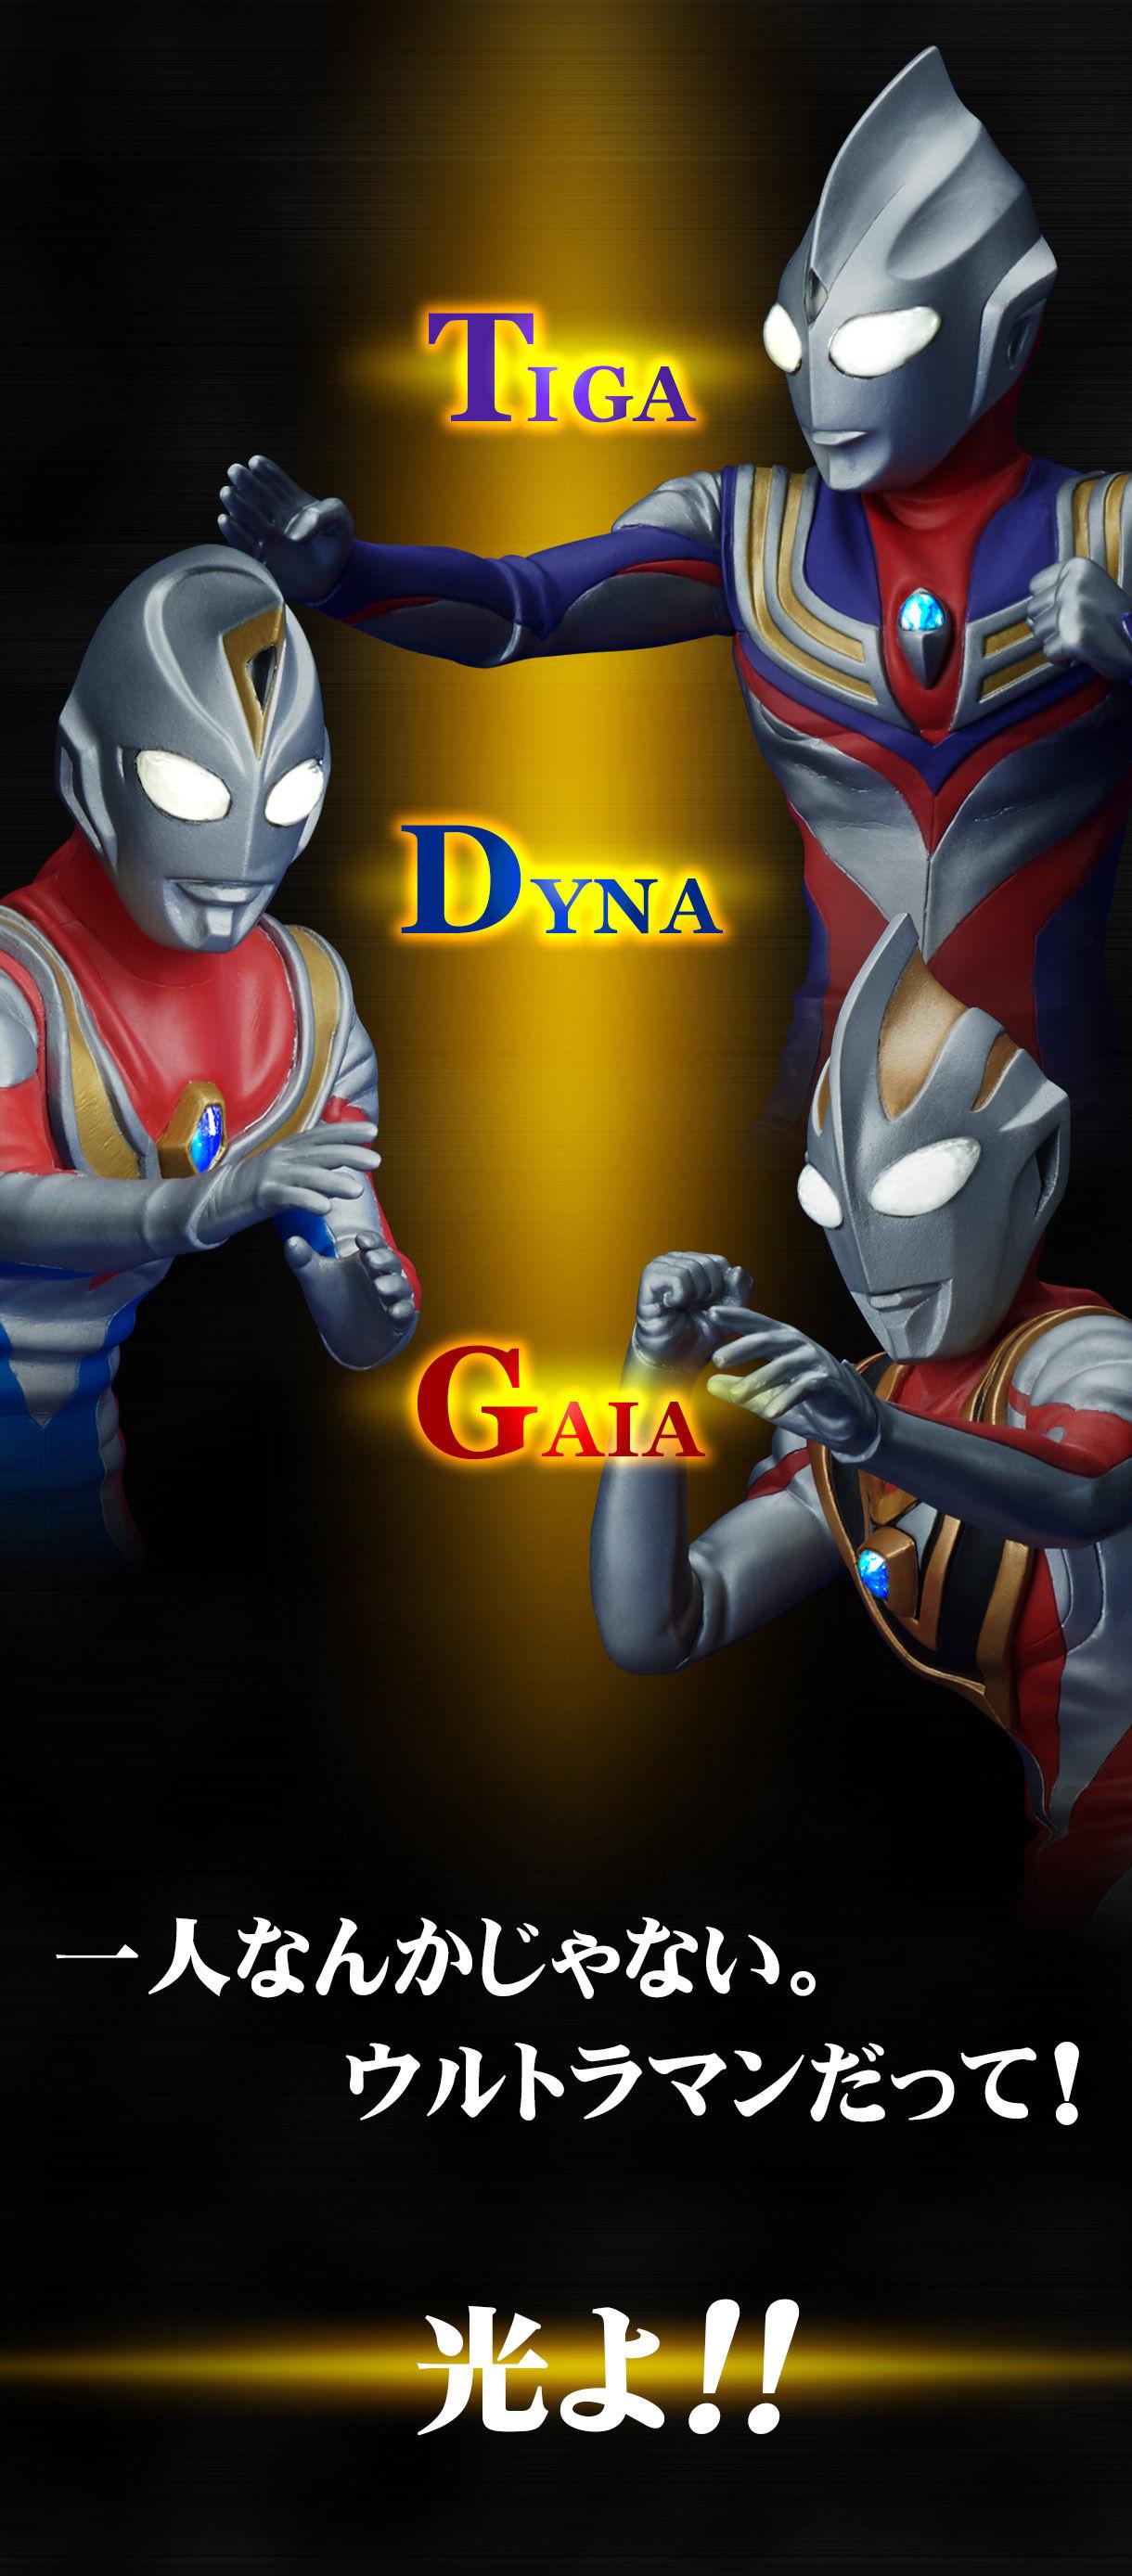 Ultraman - Ultra New Generation TDG (Tiga/Dyna/Gaia) Set (Tsuburaya Prod) 0hJkgmmJ_o